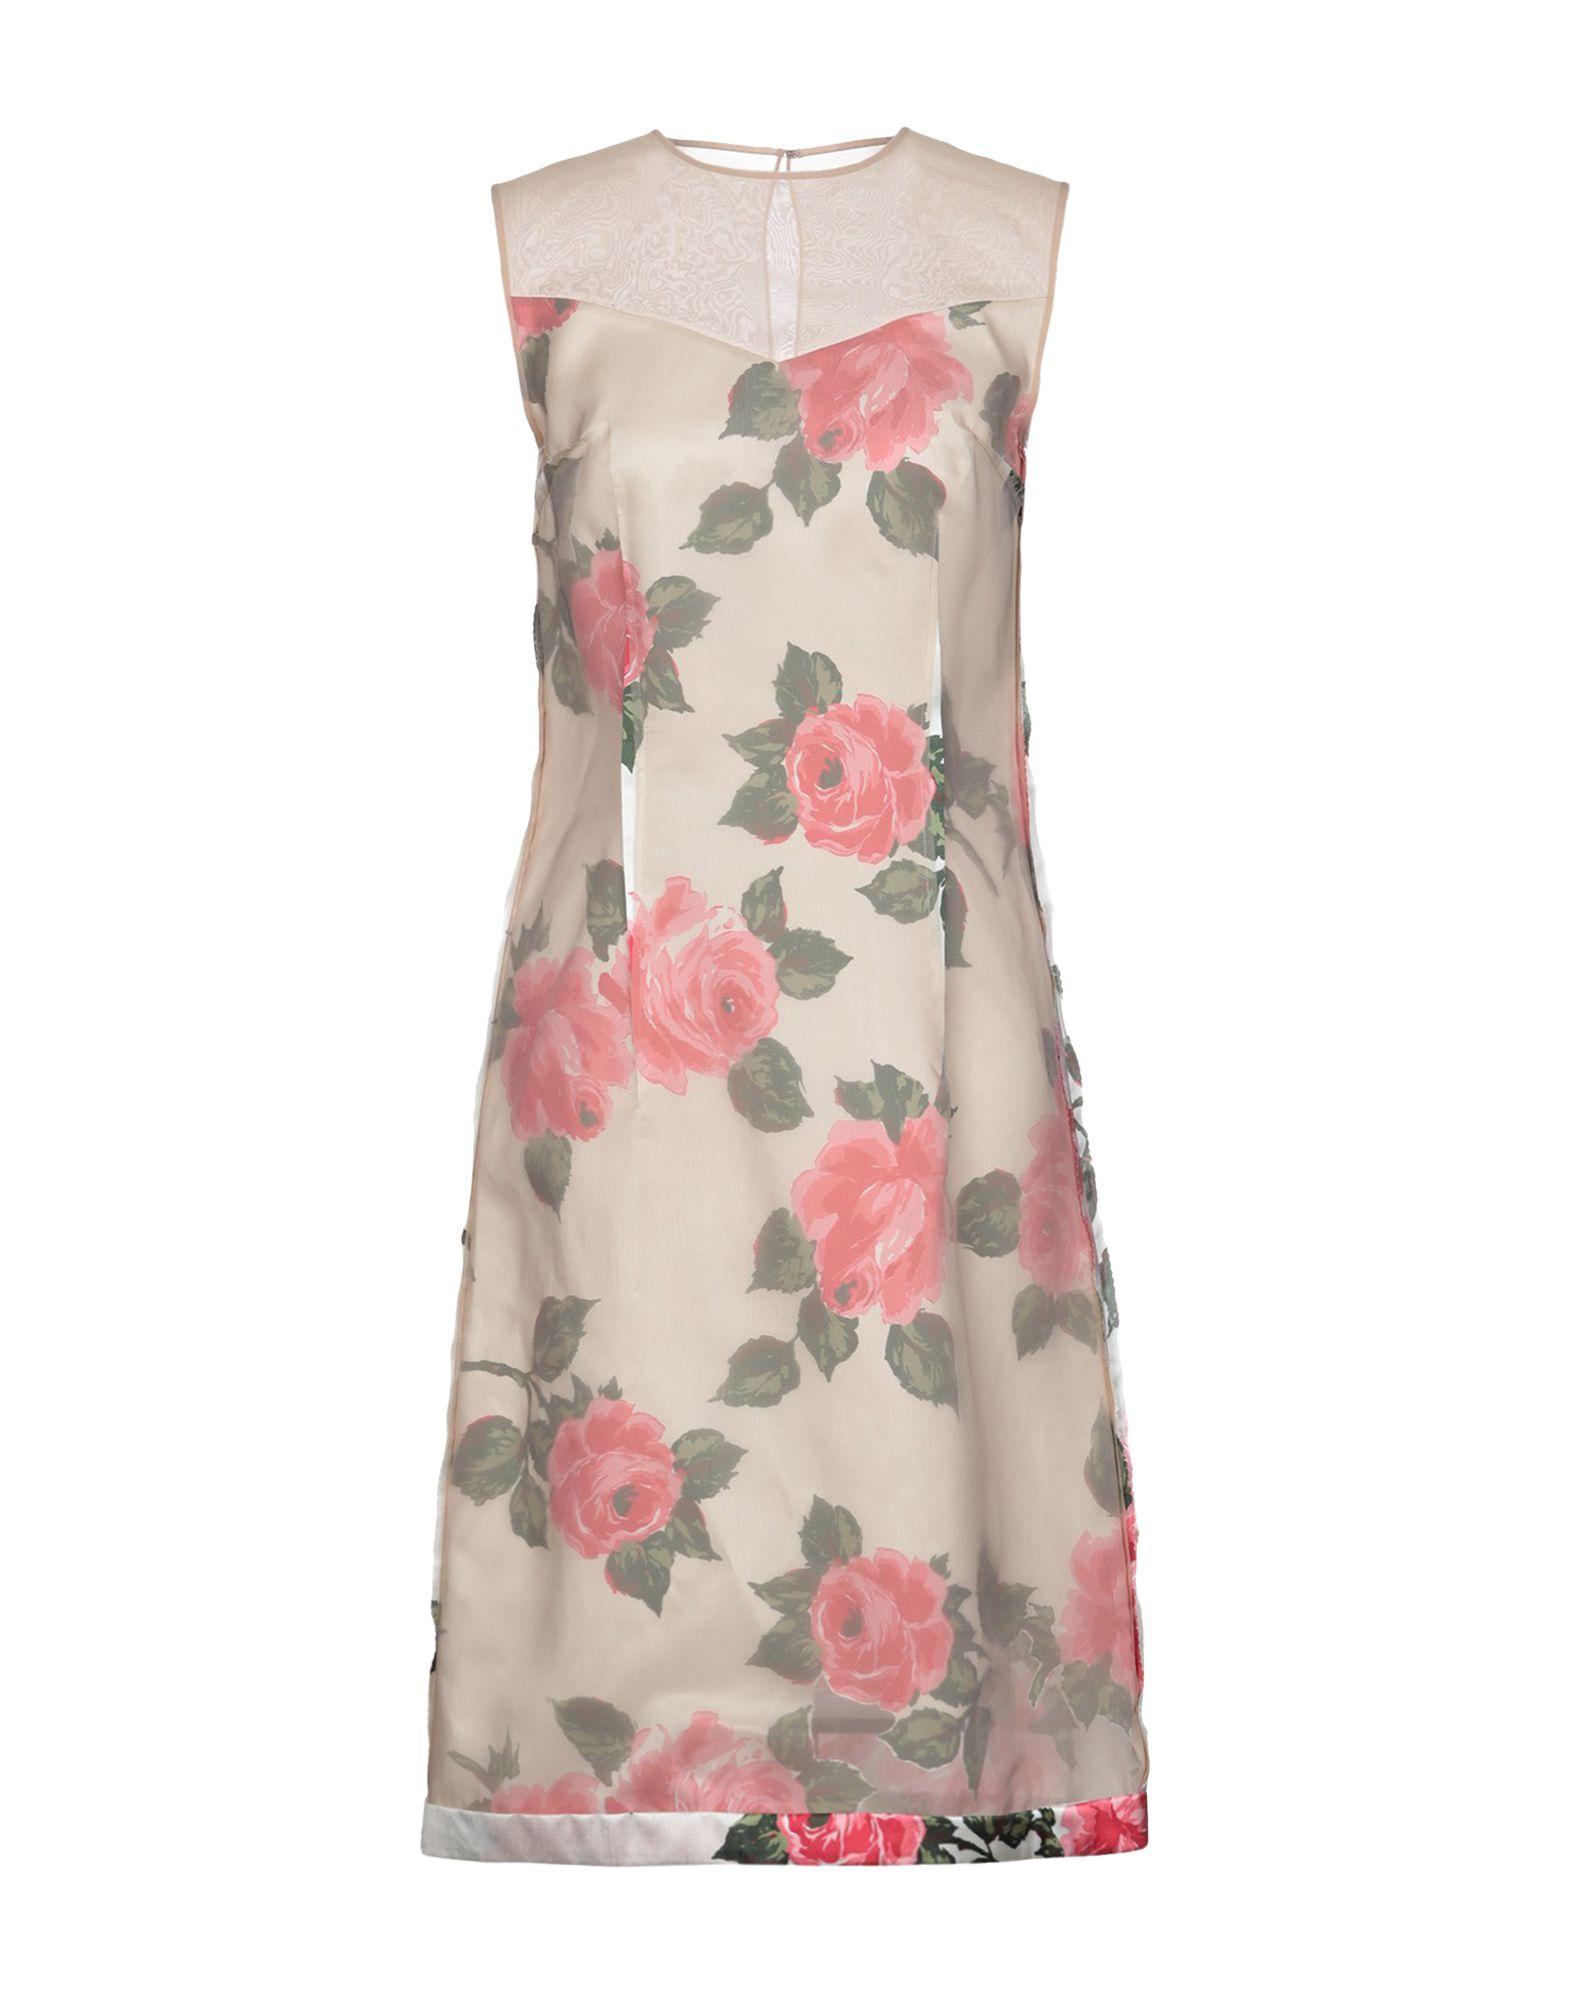 5249e8d07145 Αμπιγιέ Φορέματα Maison Margiela Γυναίκα Κολεξιόν Άνοιξη-Καλοκαίρι και  Φθινόπωρο-Χειμώνας